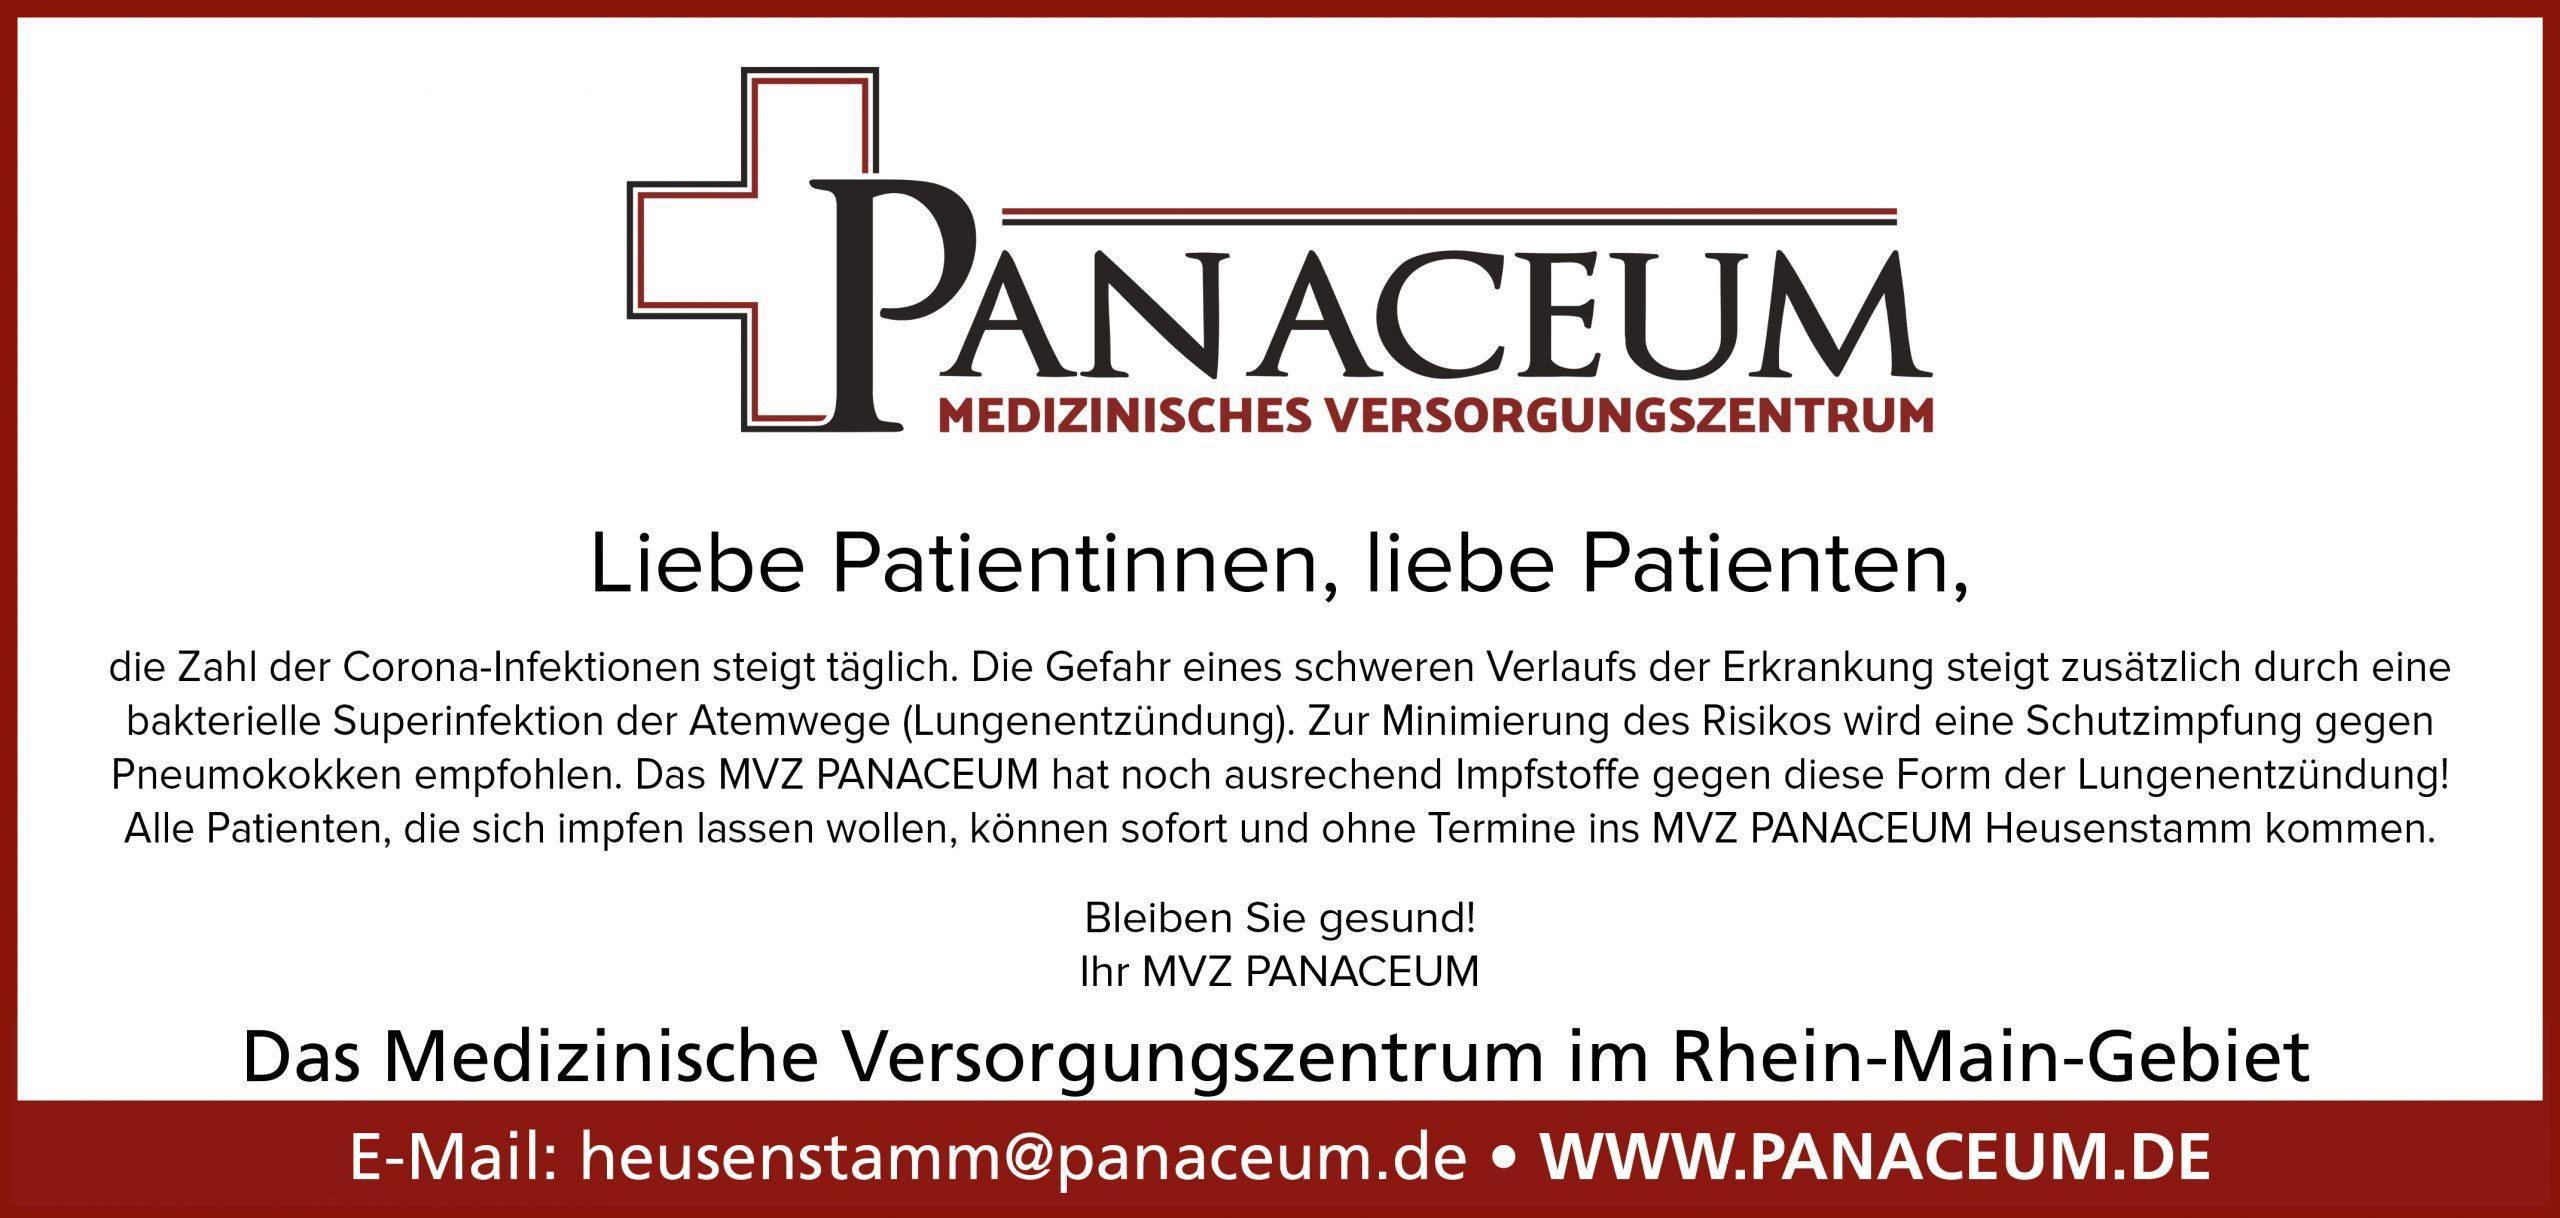 MVZ Panaceum Heusenstamm